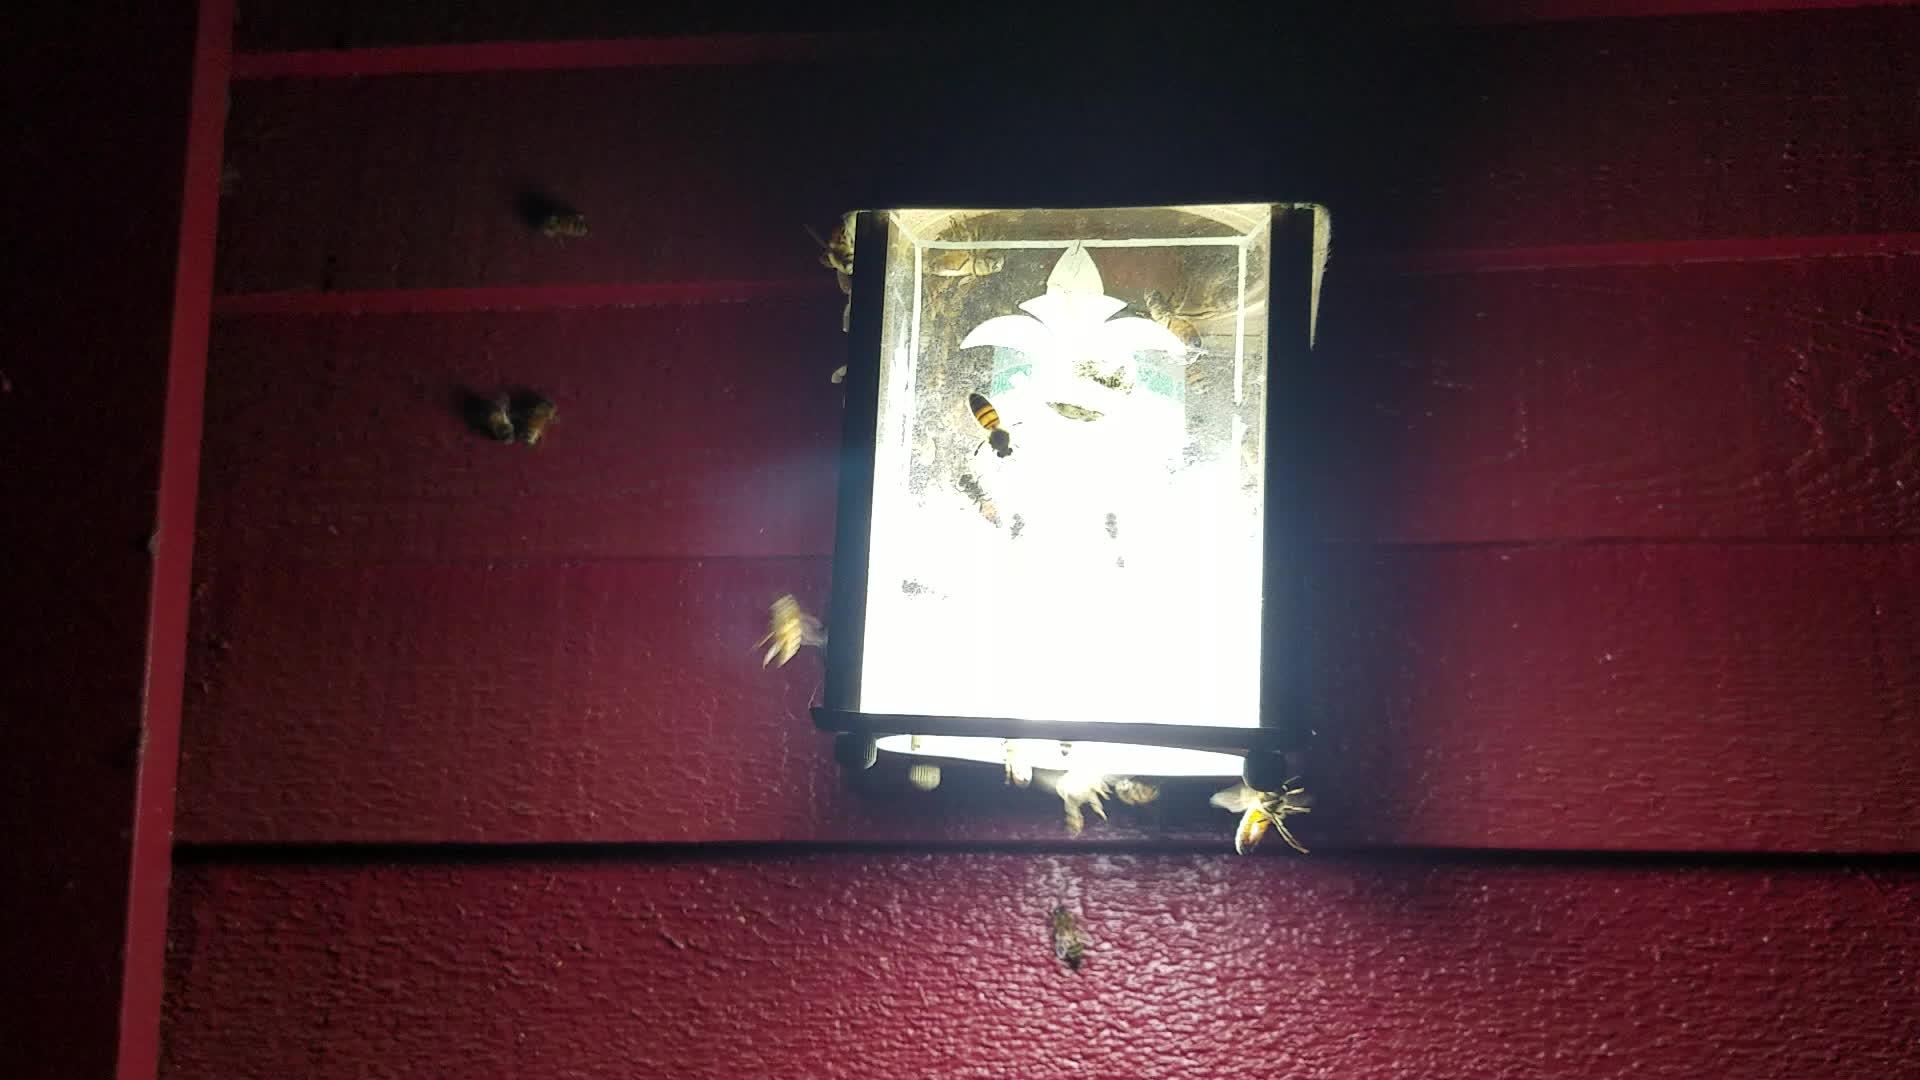 beekeeping, Zombees? GIFs